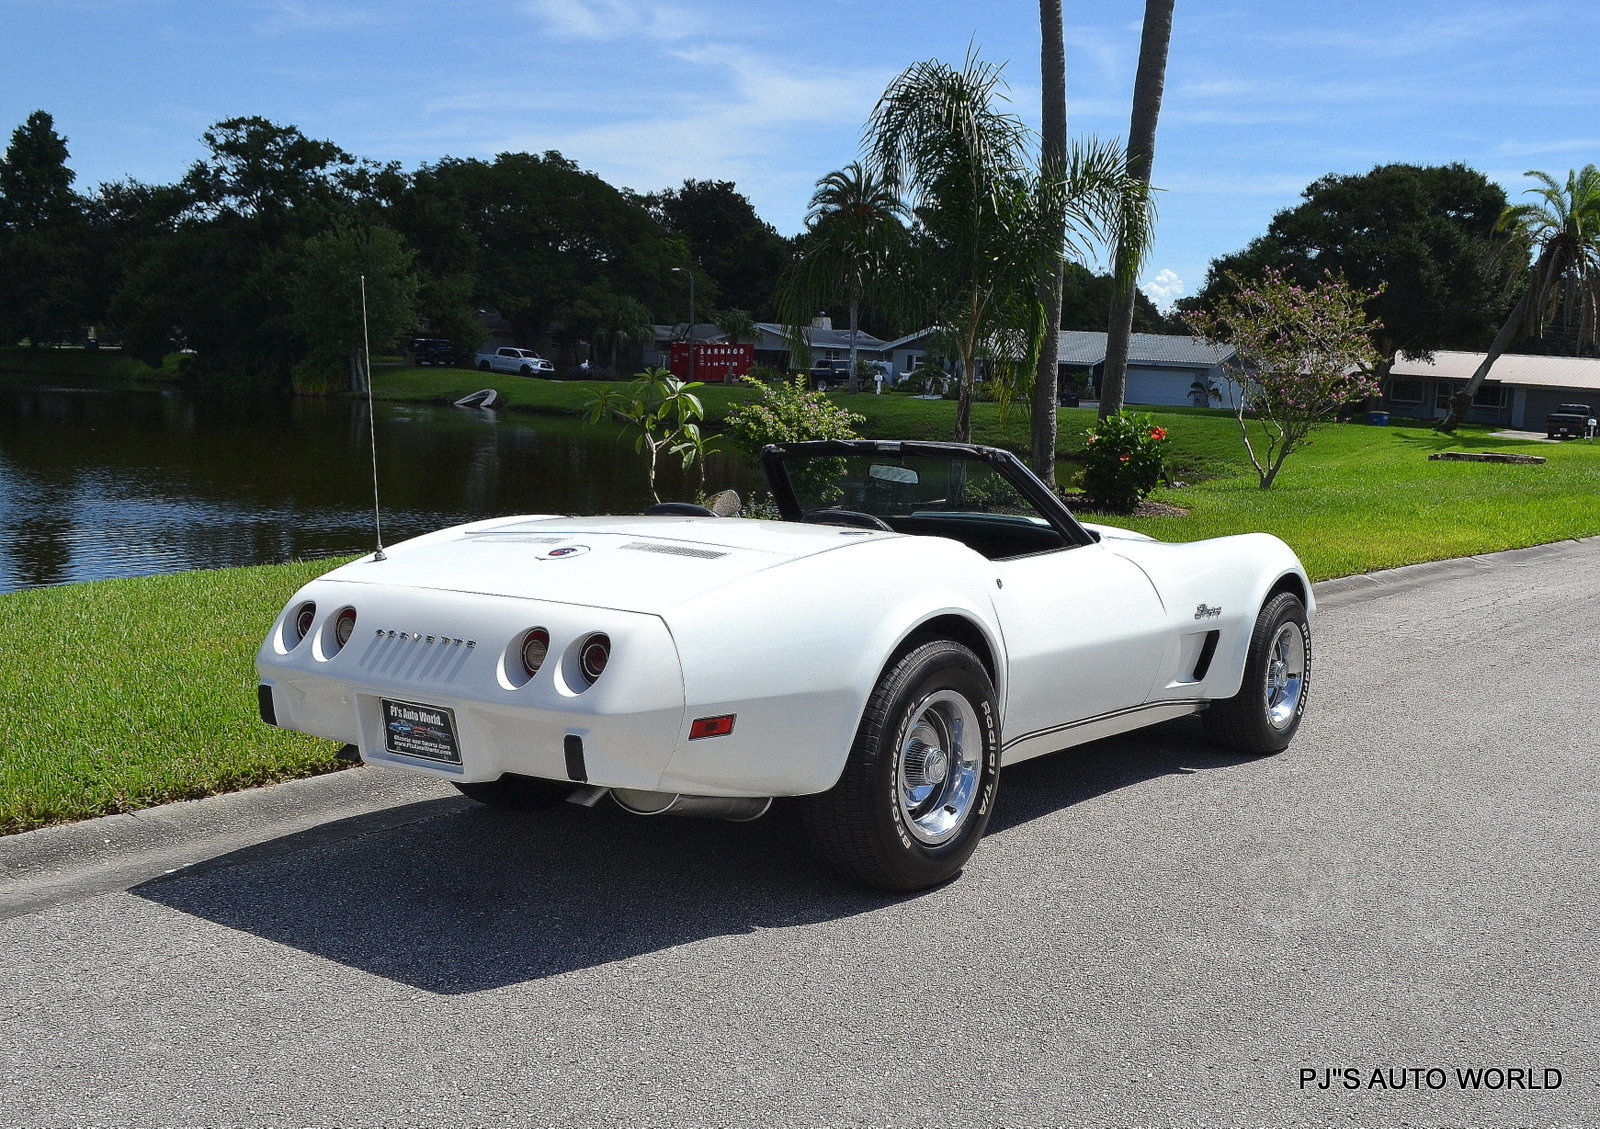 1975 Chevrolet Corvette for sale #98759 | MCG